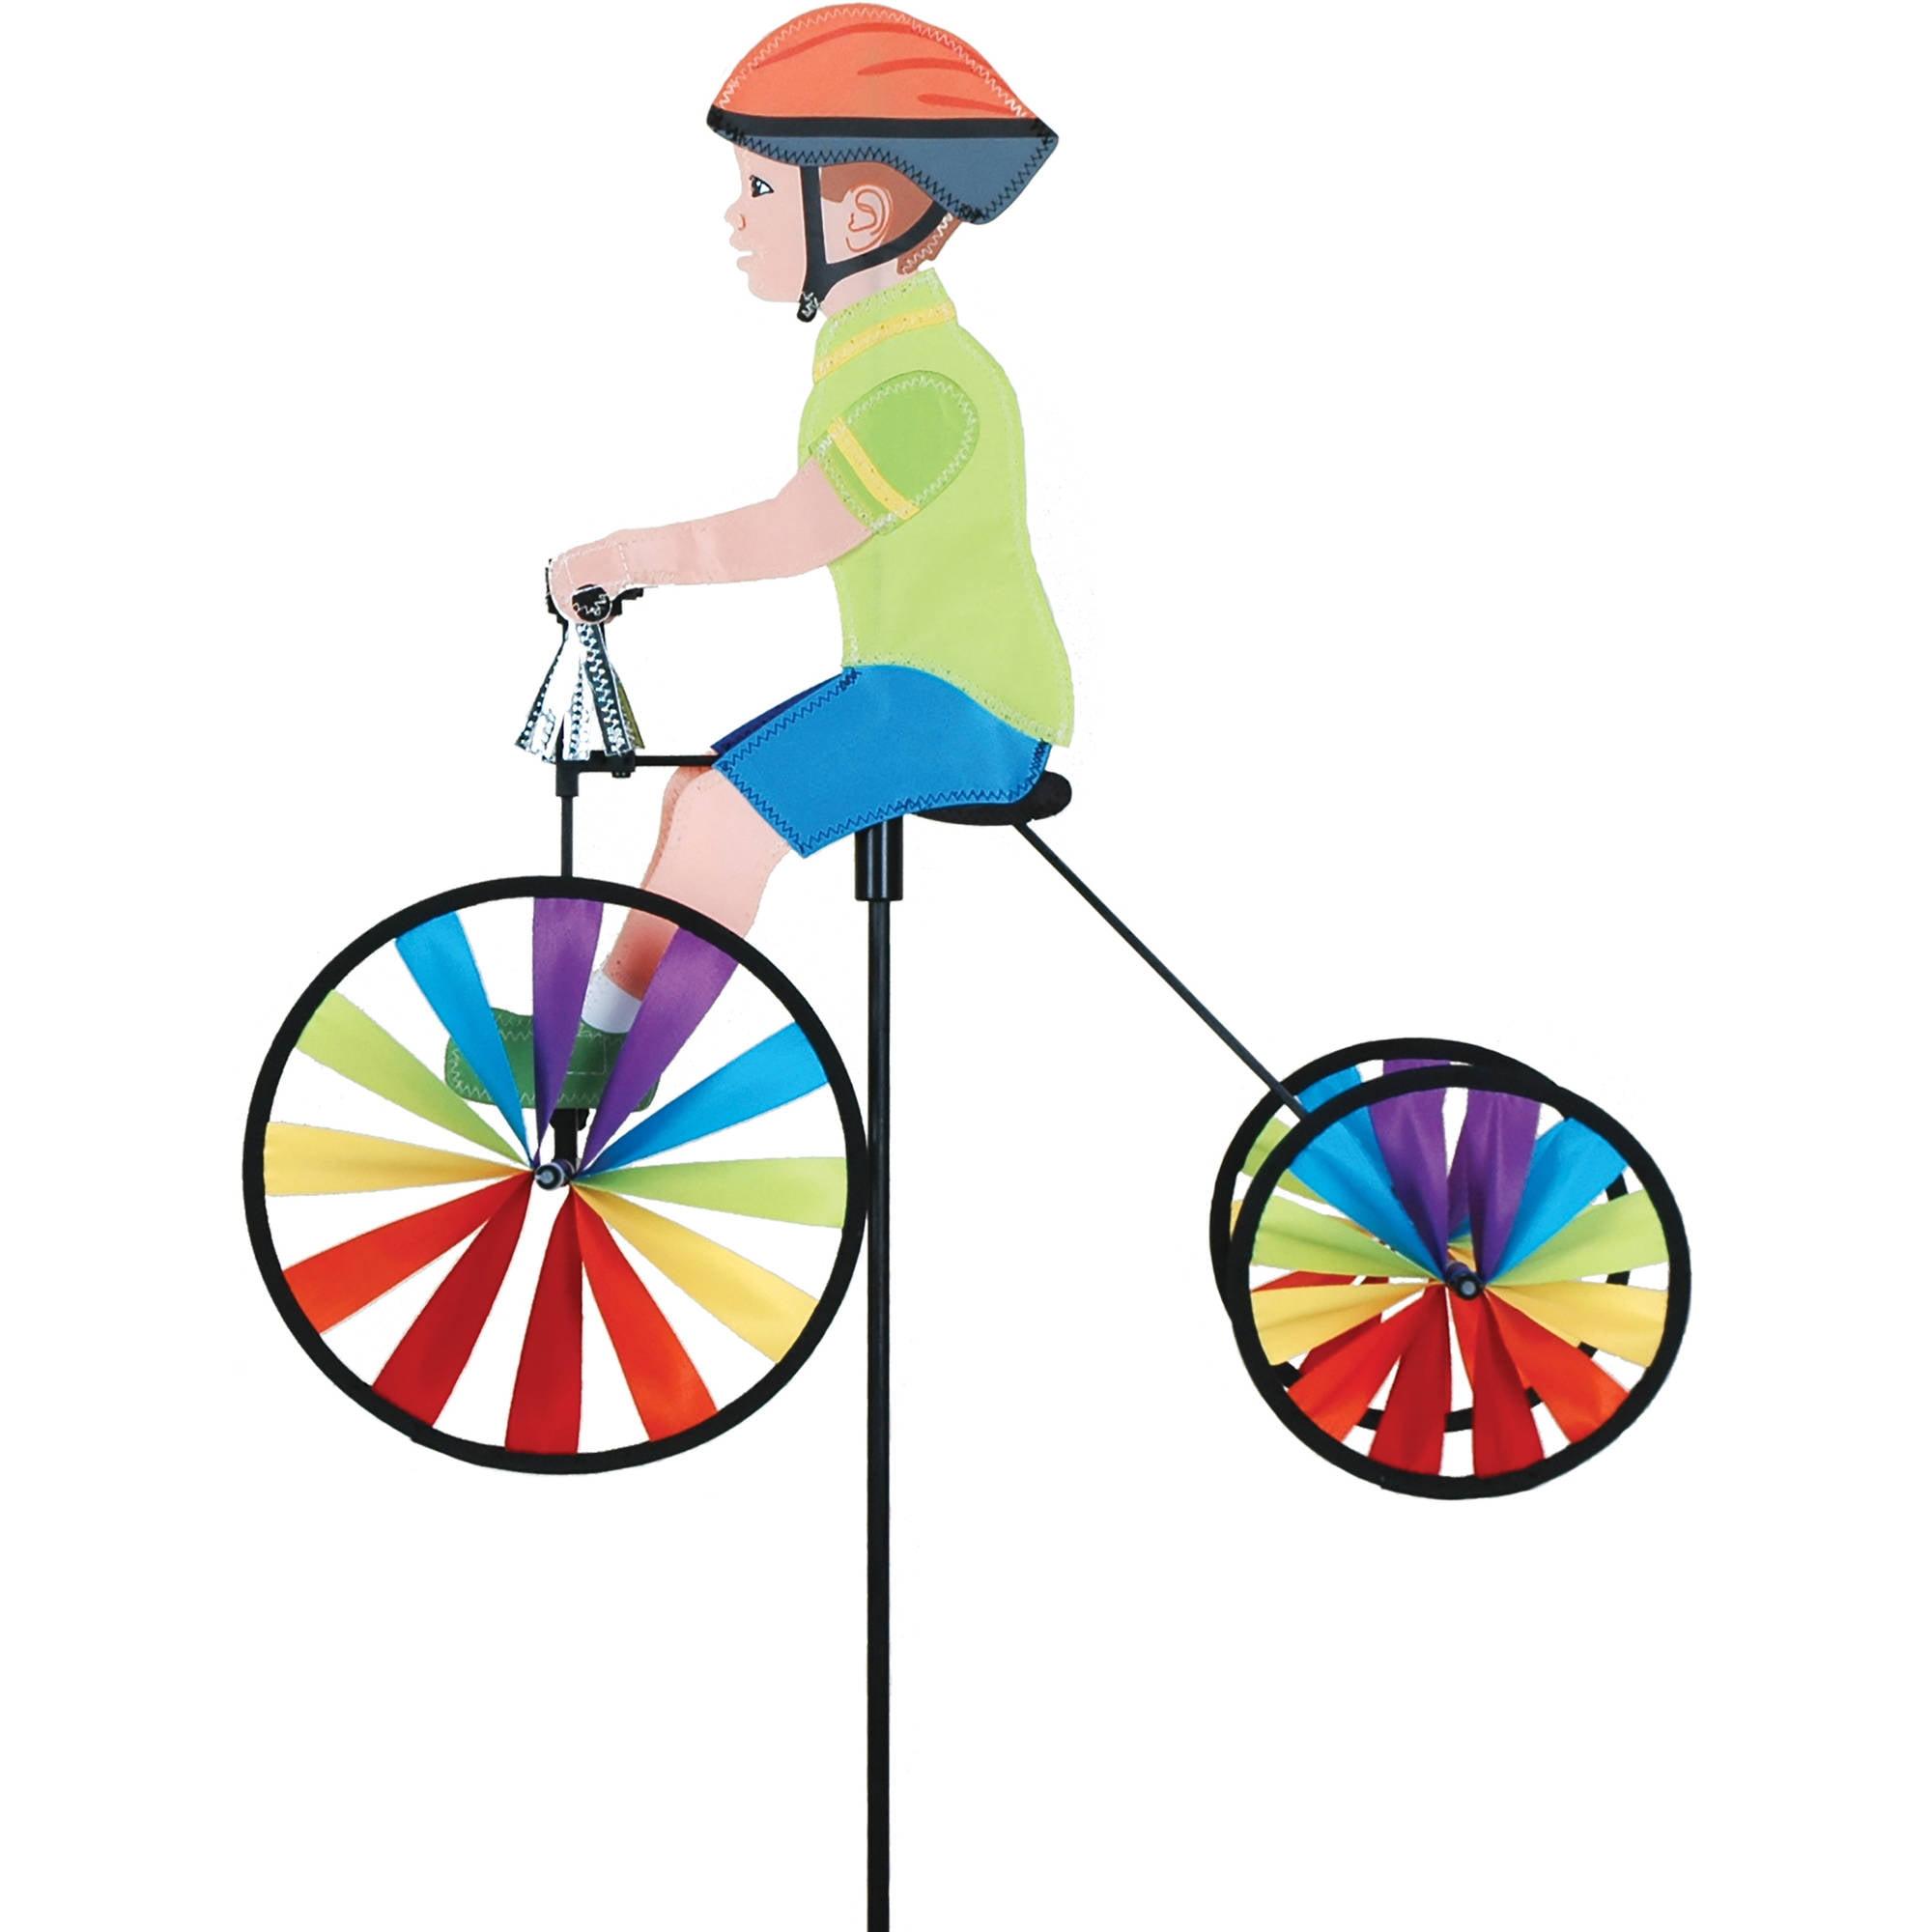 "Premier Designs 19"" Tricycle Spinner, Boy by Premier Kites"